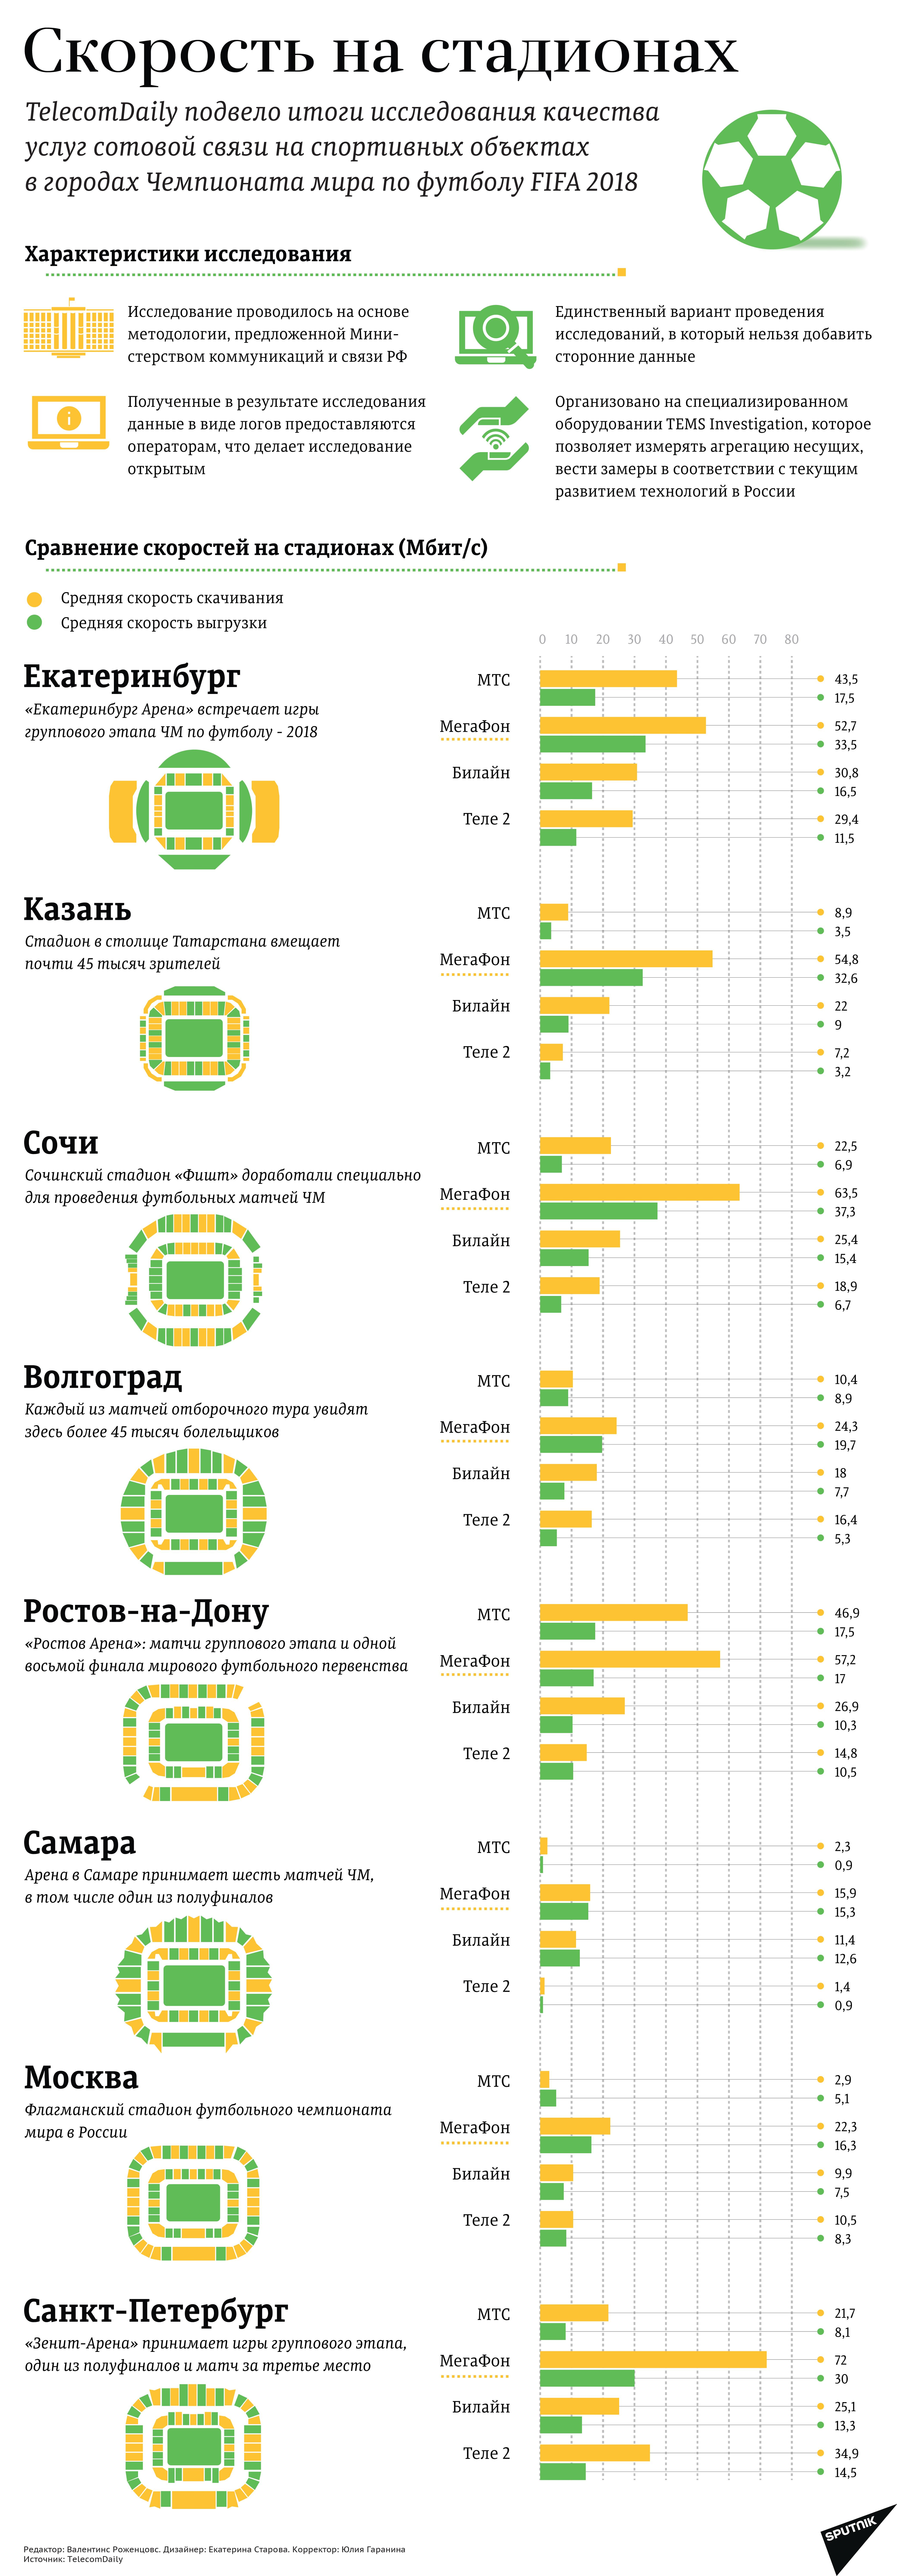 Скорость на стадионах - Sputnik Таджикистан